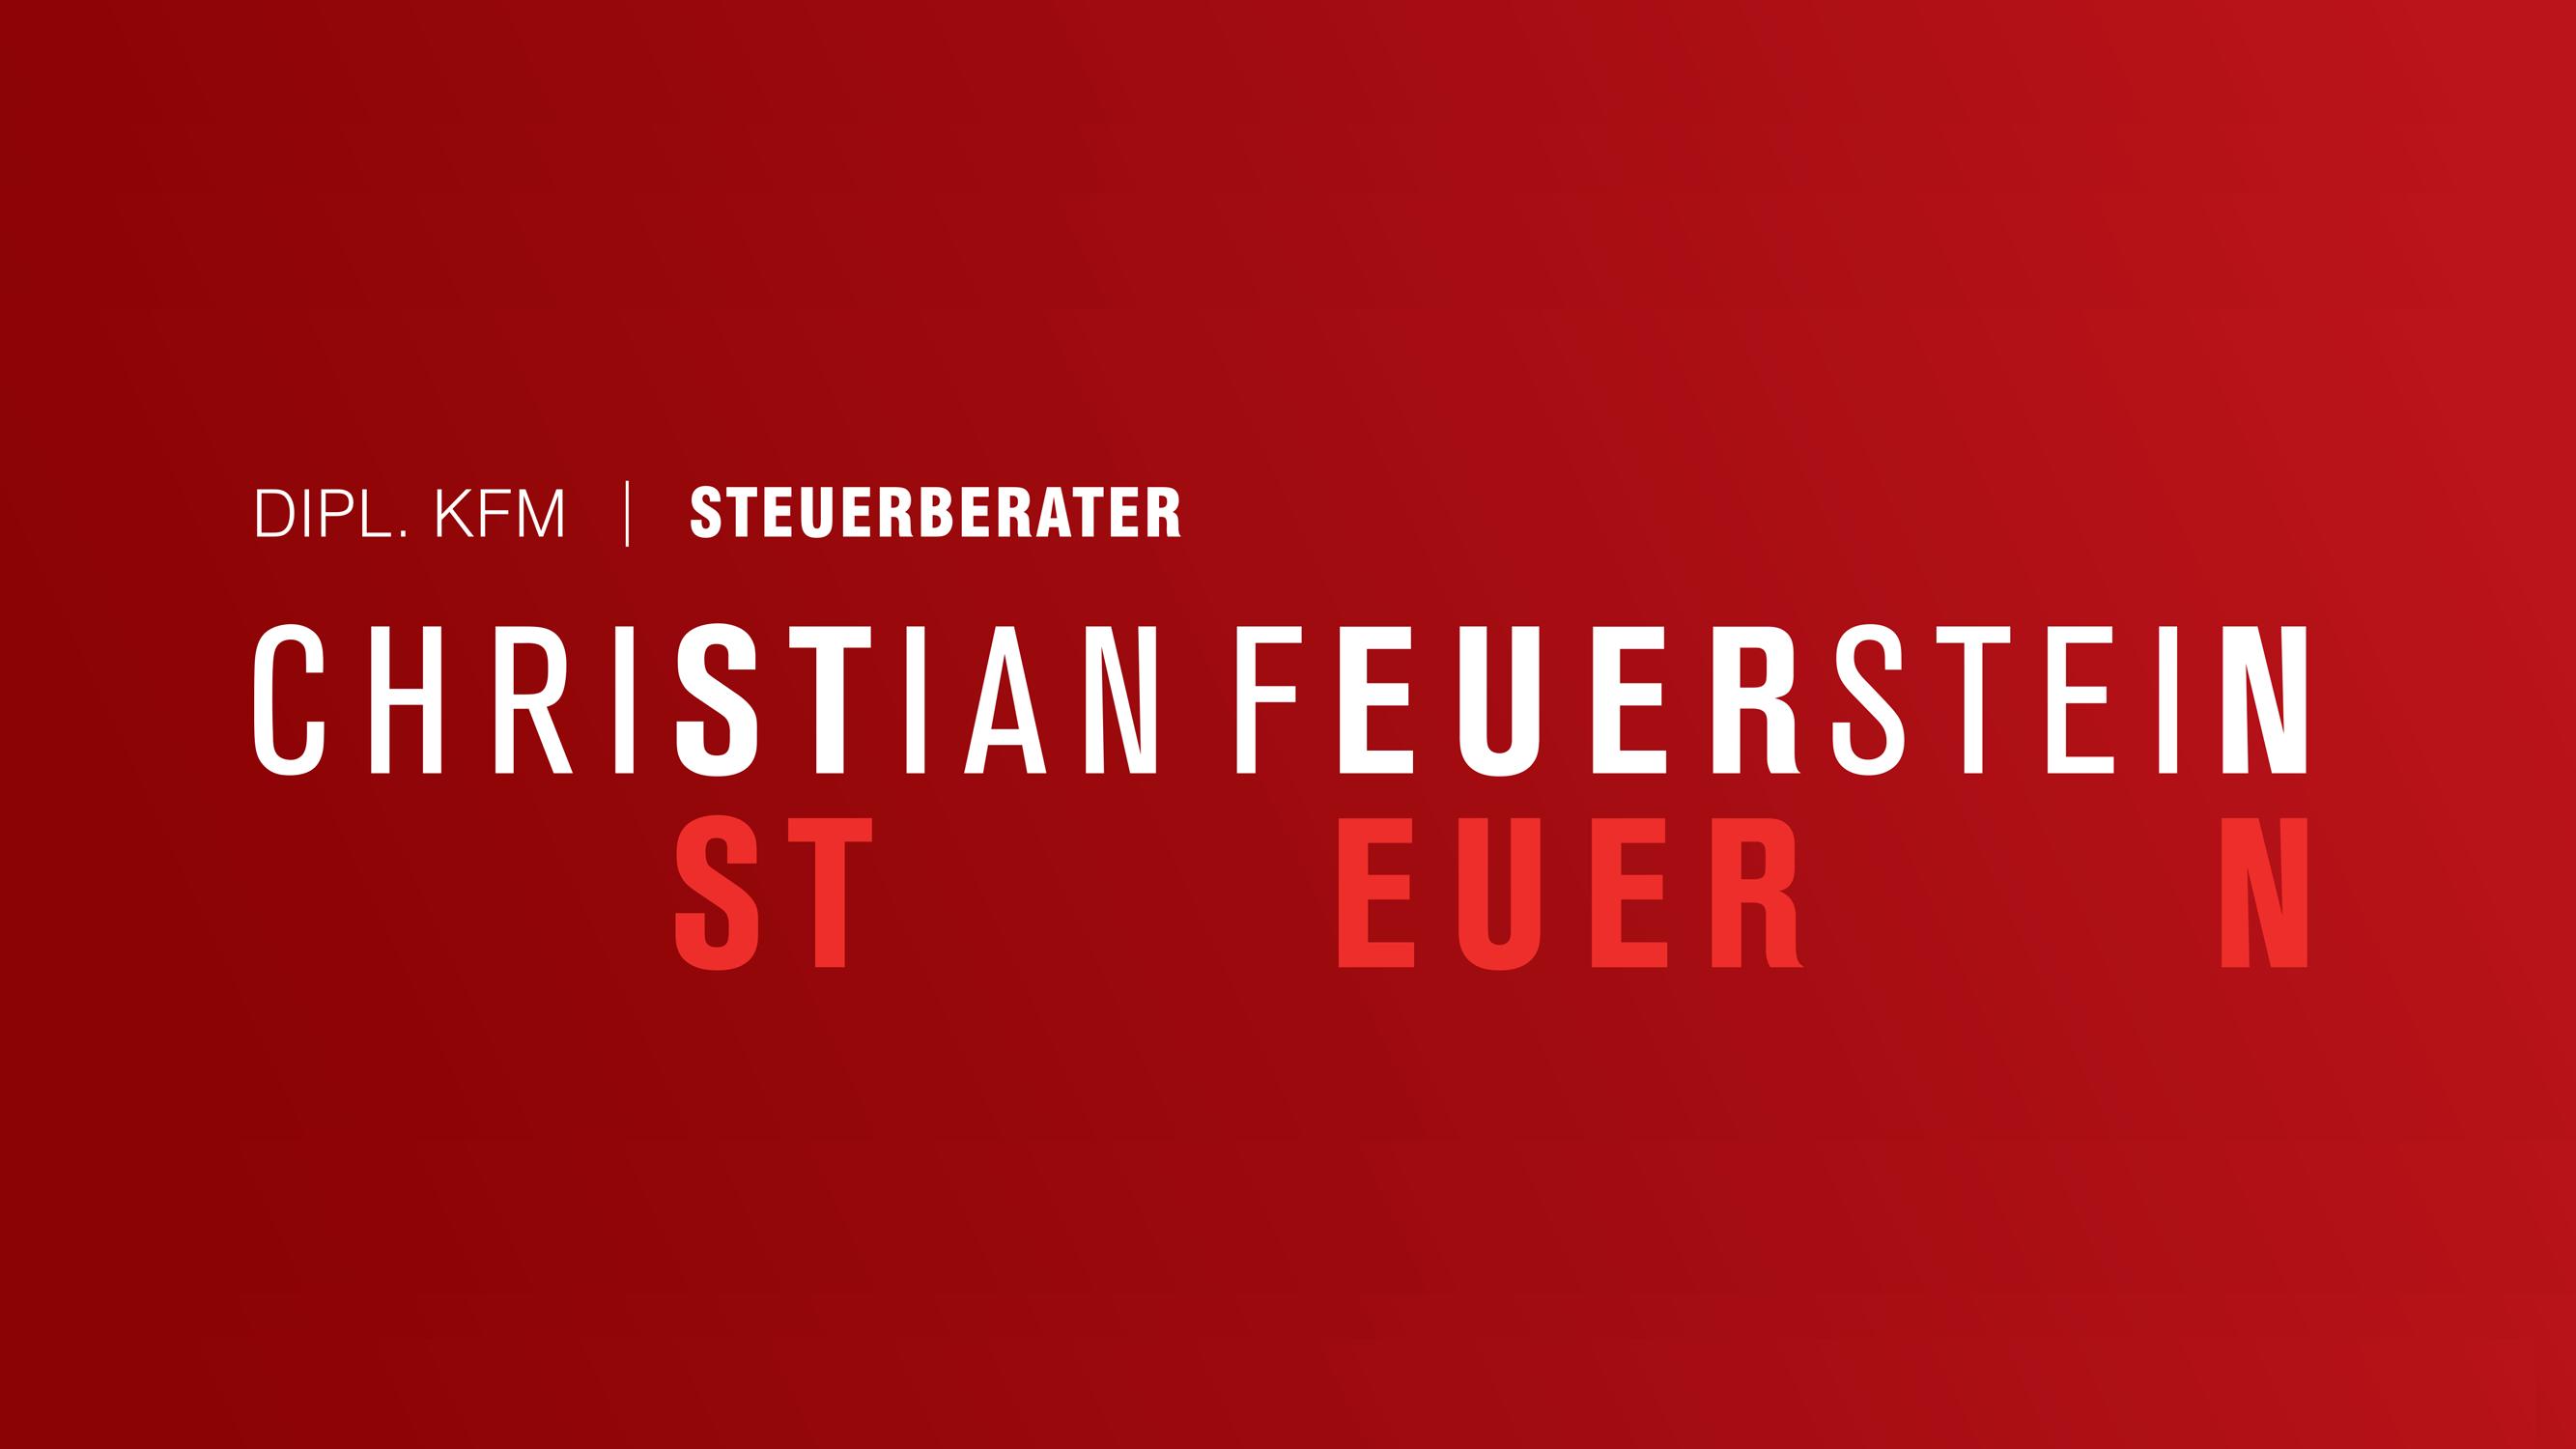 (c) Feuerstein-steuern.de